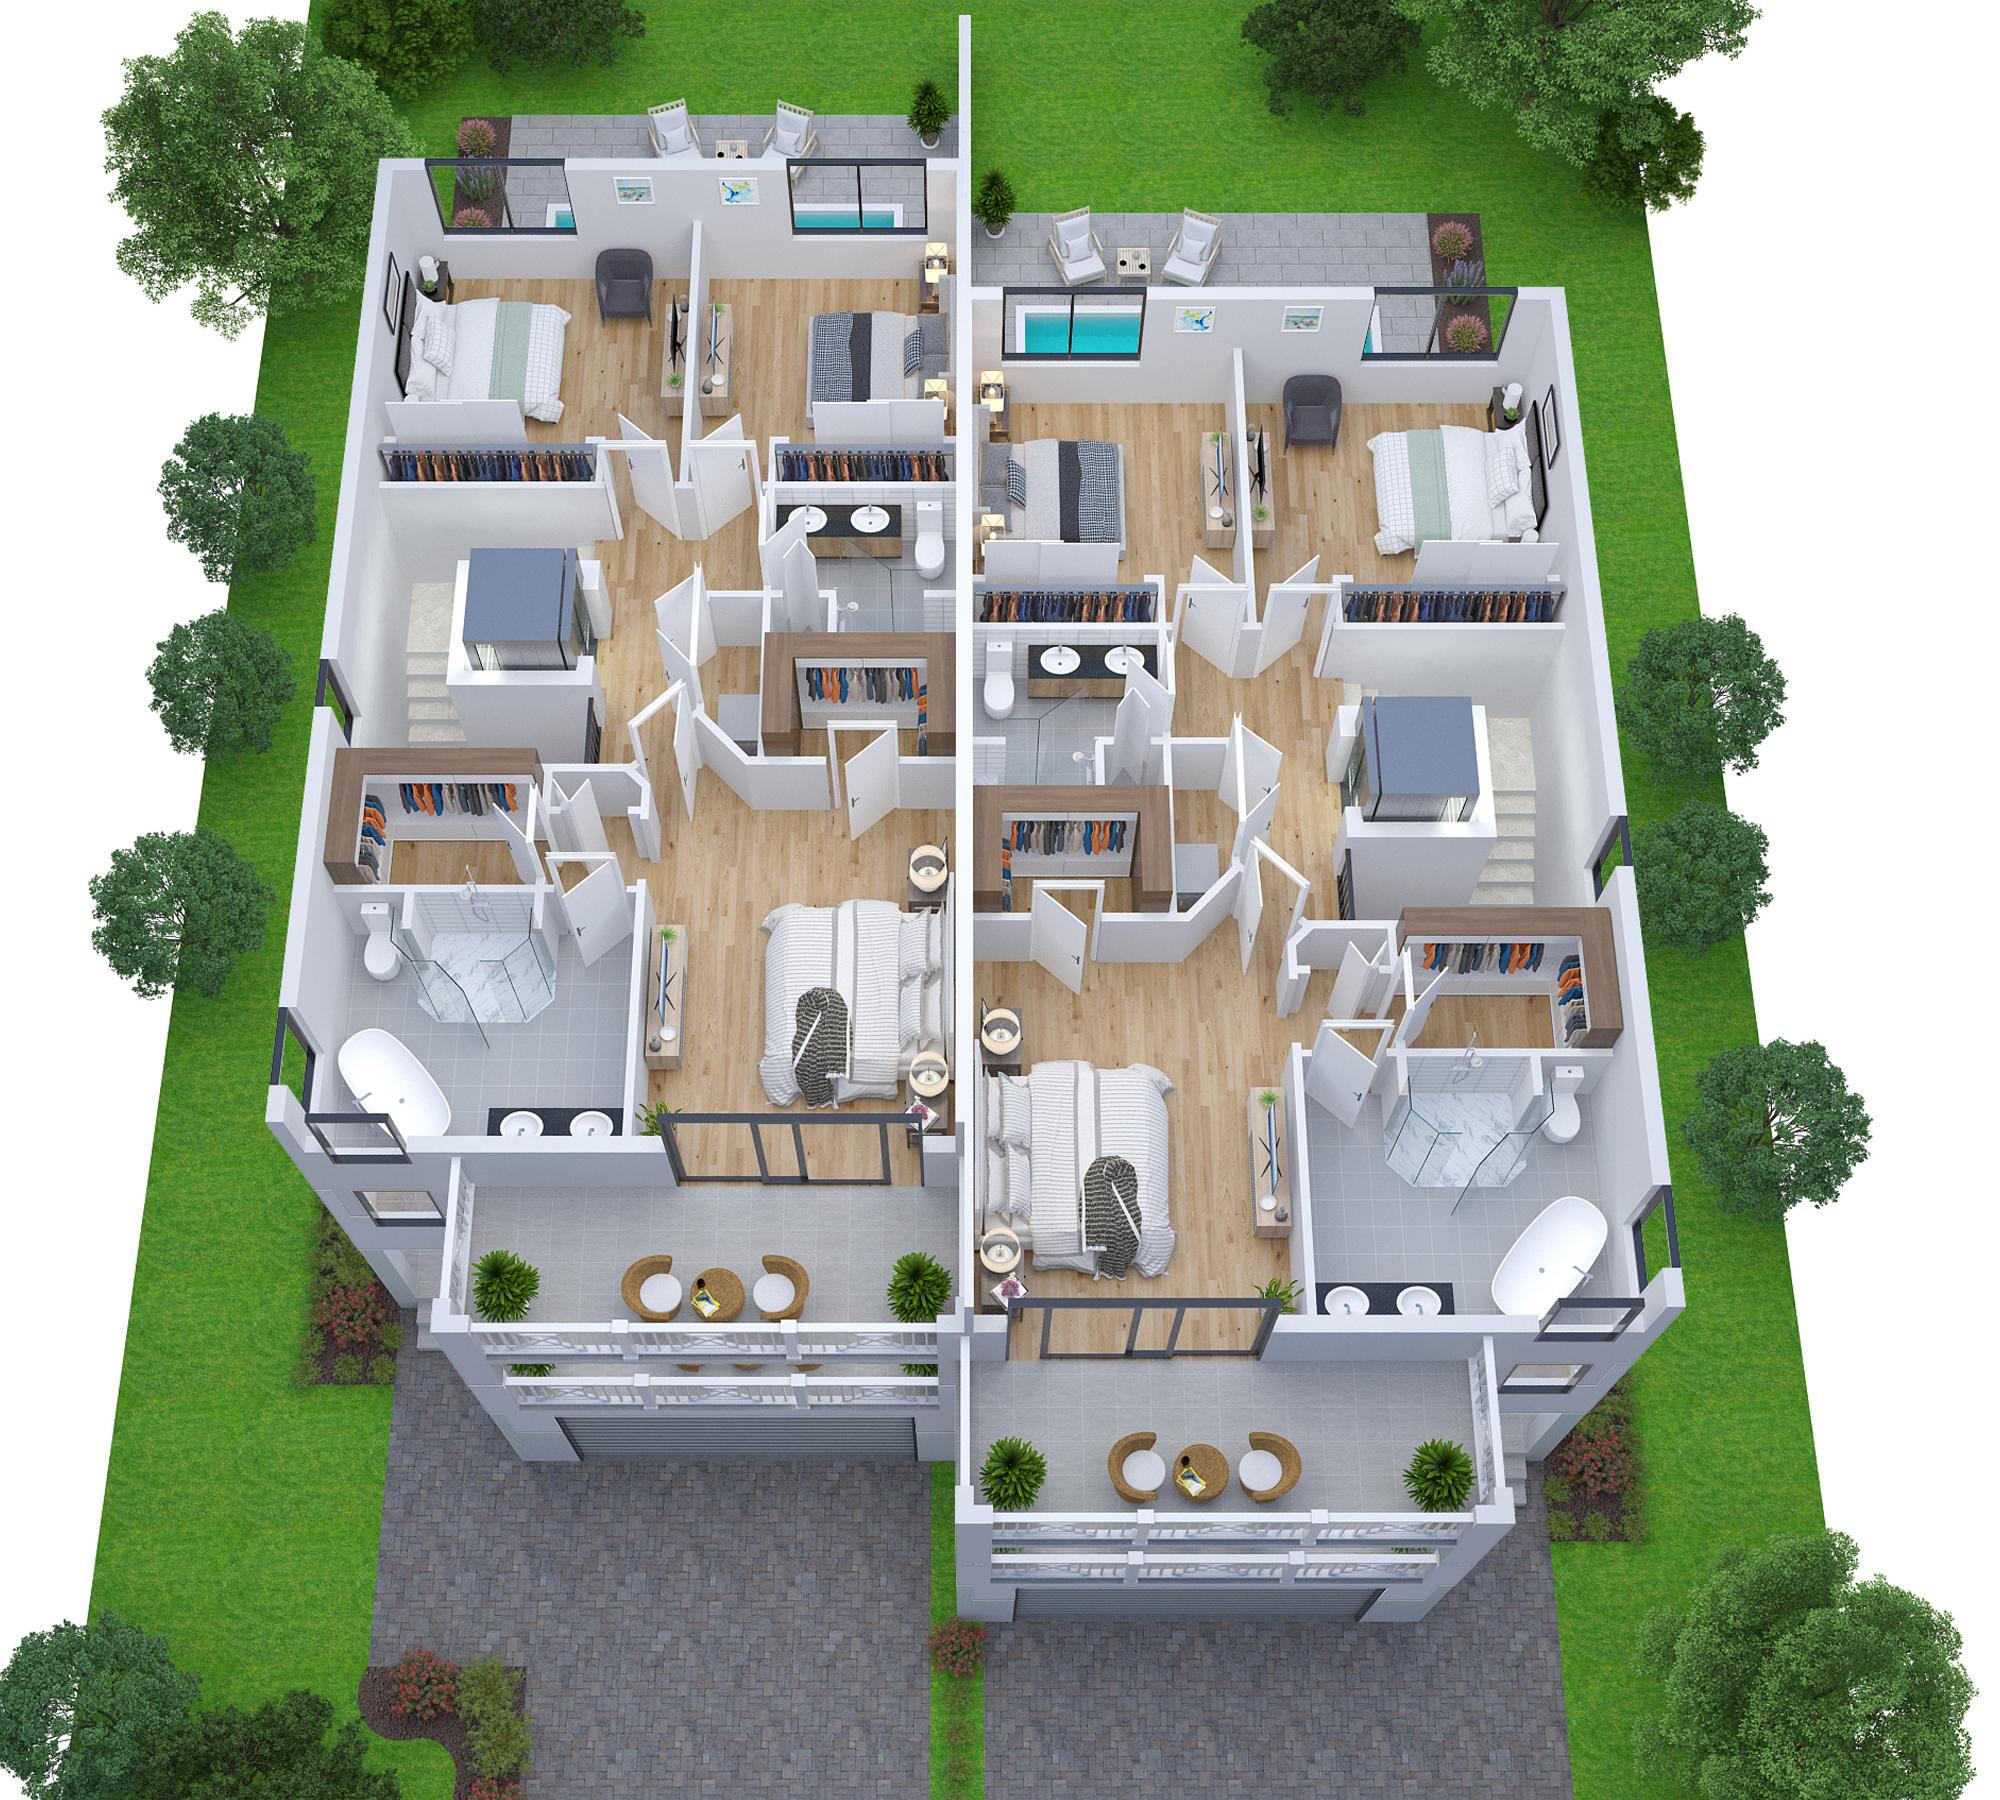 Lot 4 5 -Third floor plan